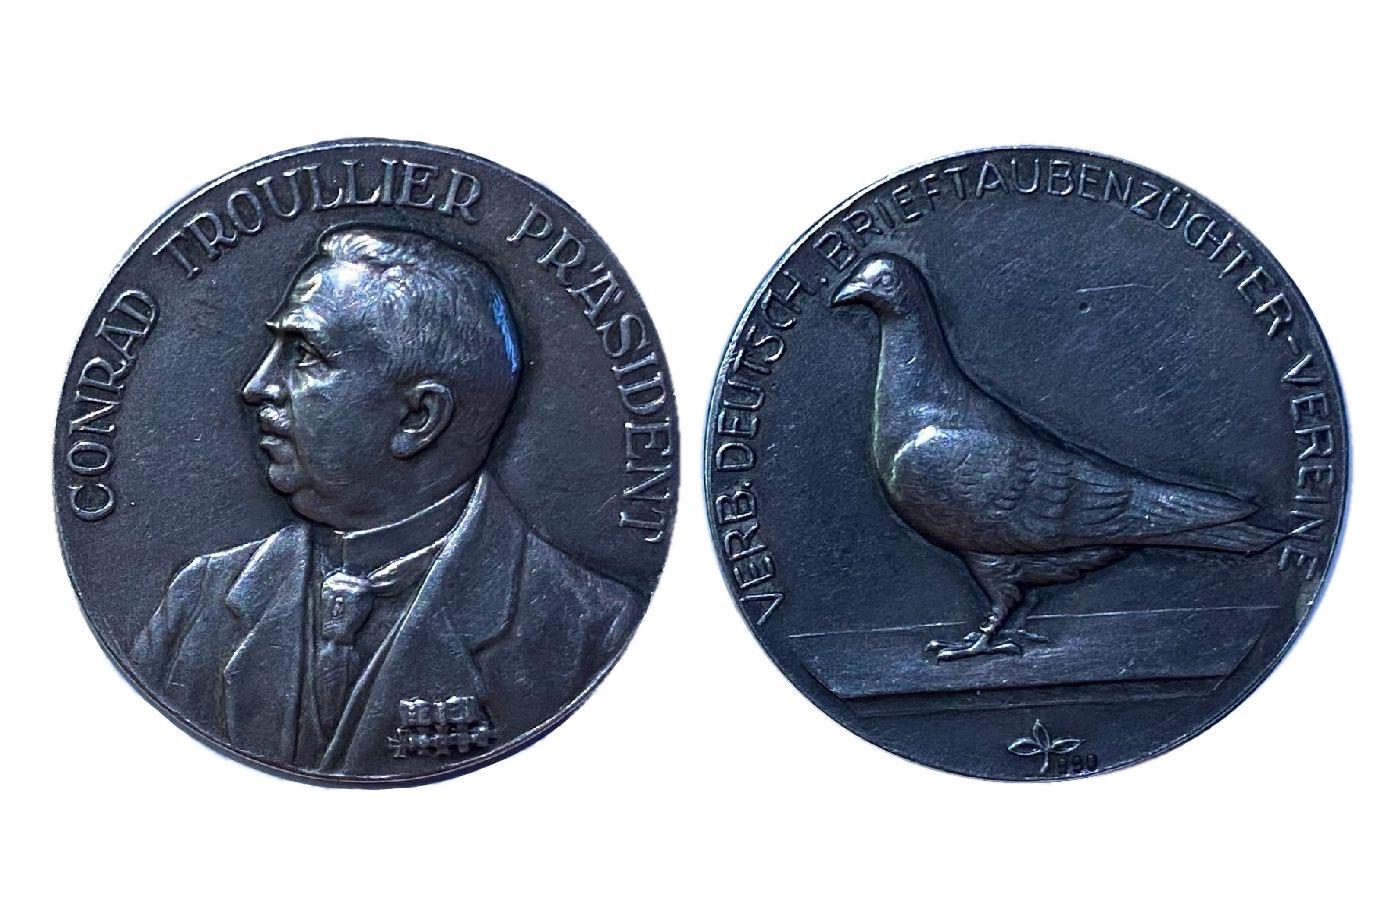 Medaille in Silber mit Präsident Conrad Troullier